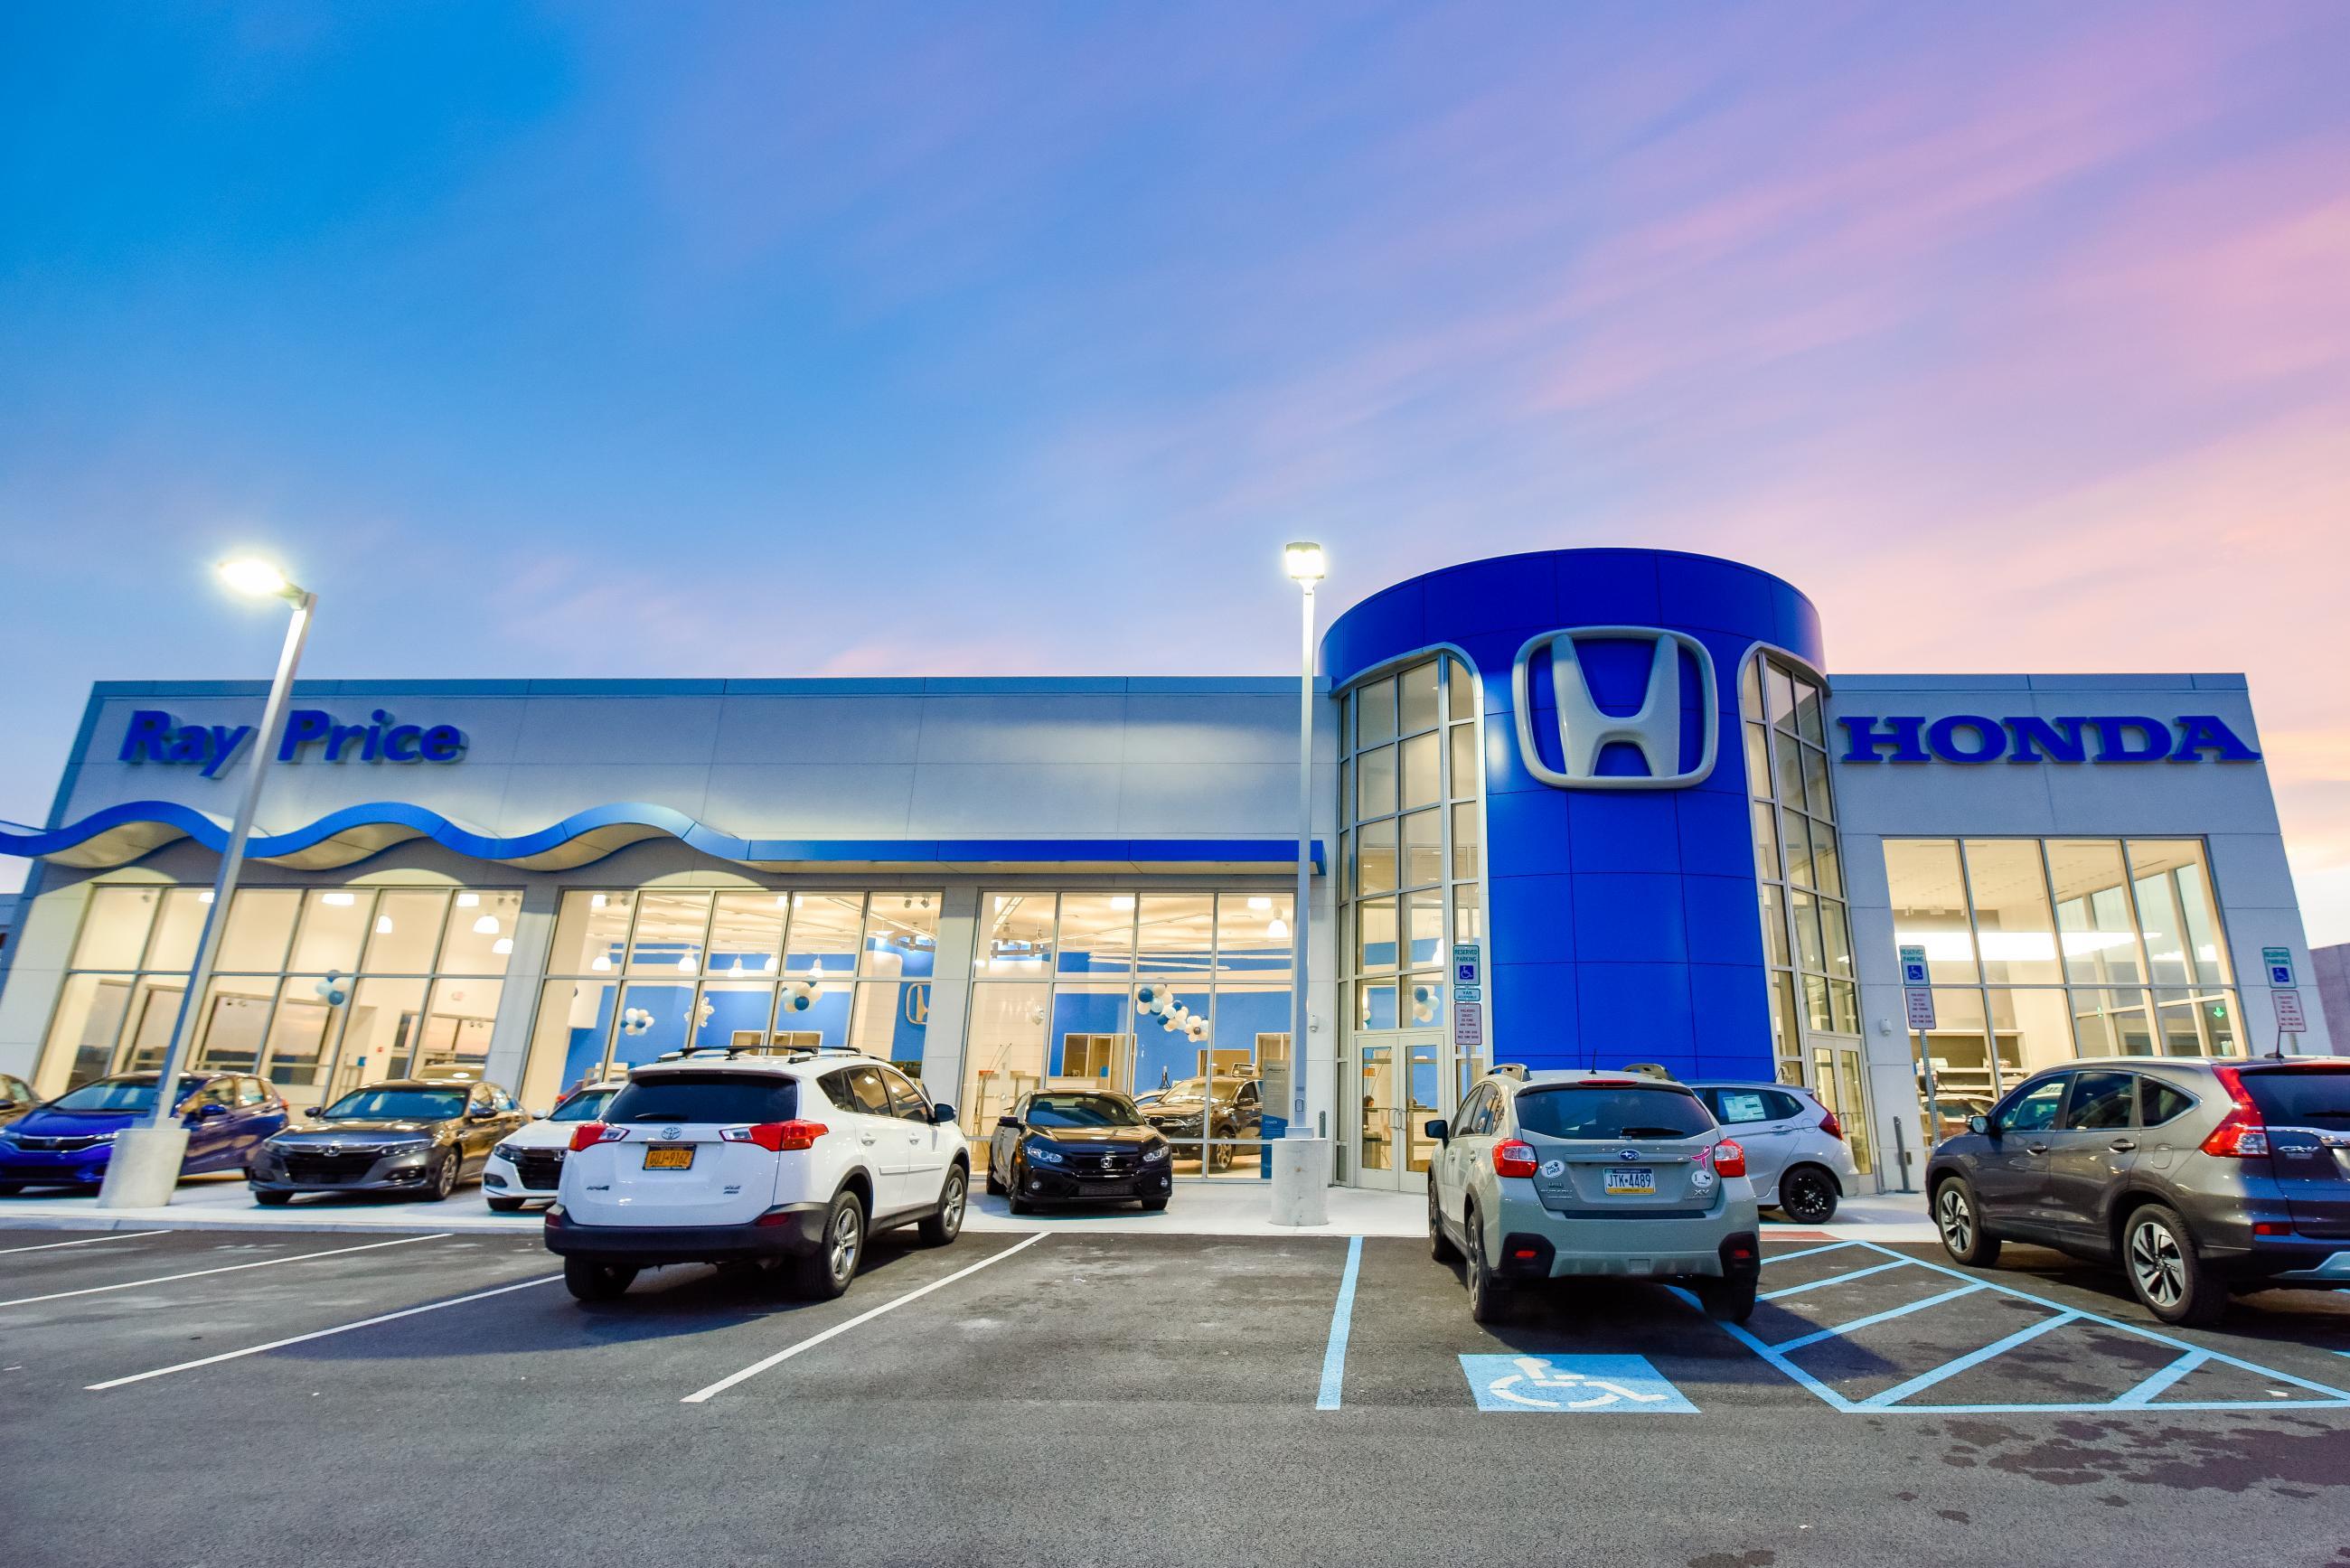 Ray Price Honda | Custom Facilities